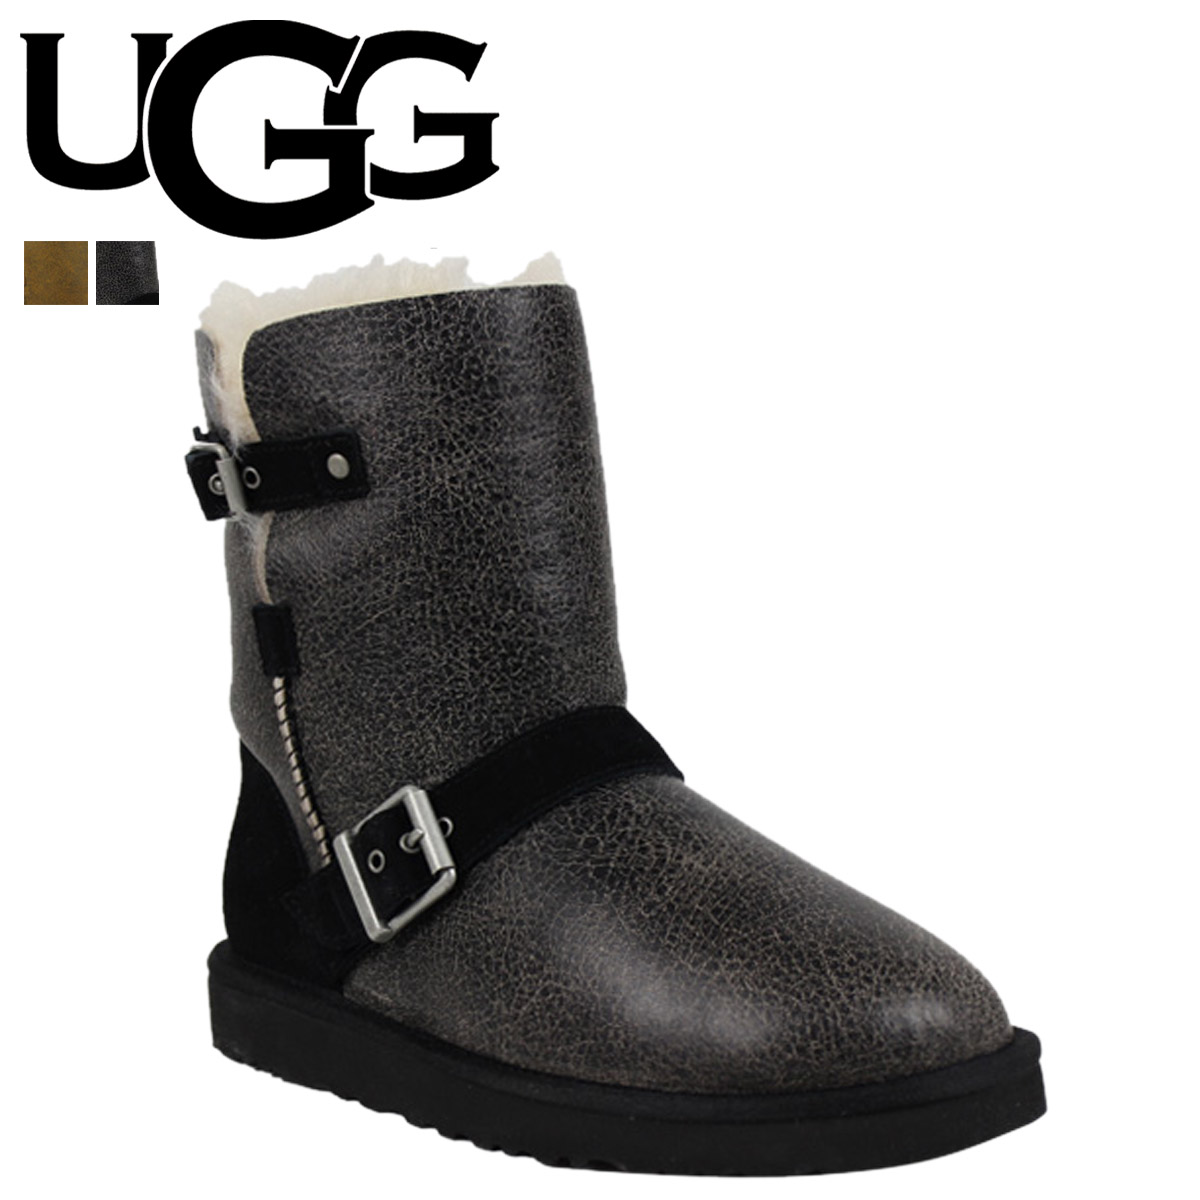 UGG UGG women's classic short Dillinger boots 2 color CLASSIC SHORT DYLYN women's sheepskin bomber machined 2014 SPRING new 1001202 [regular]